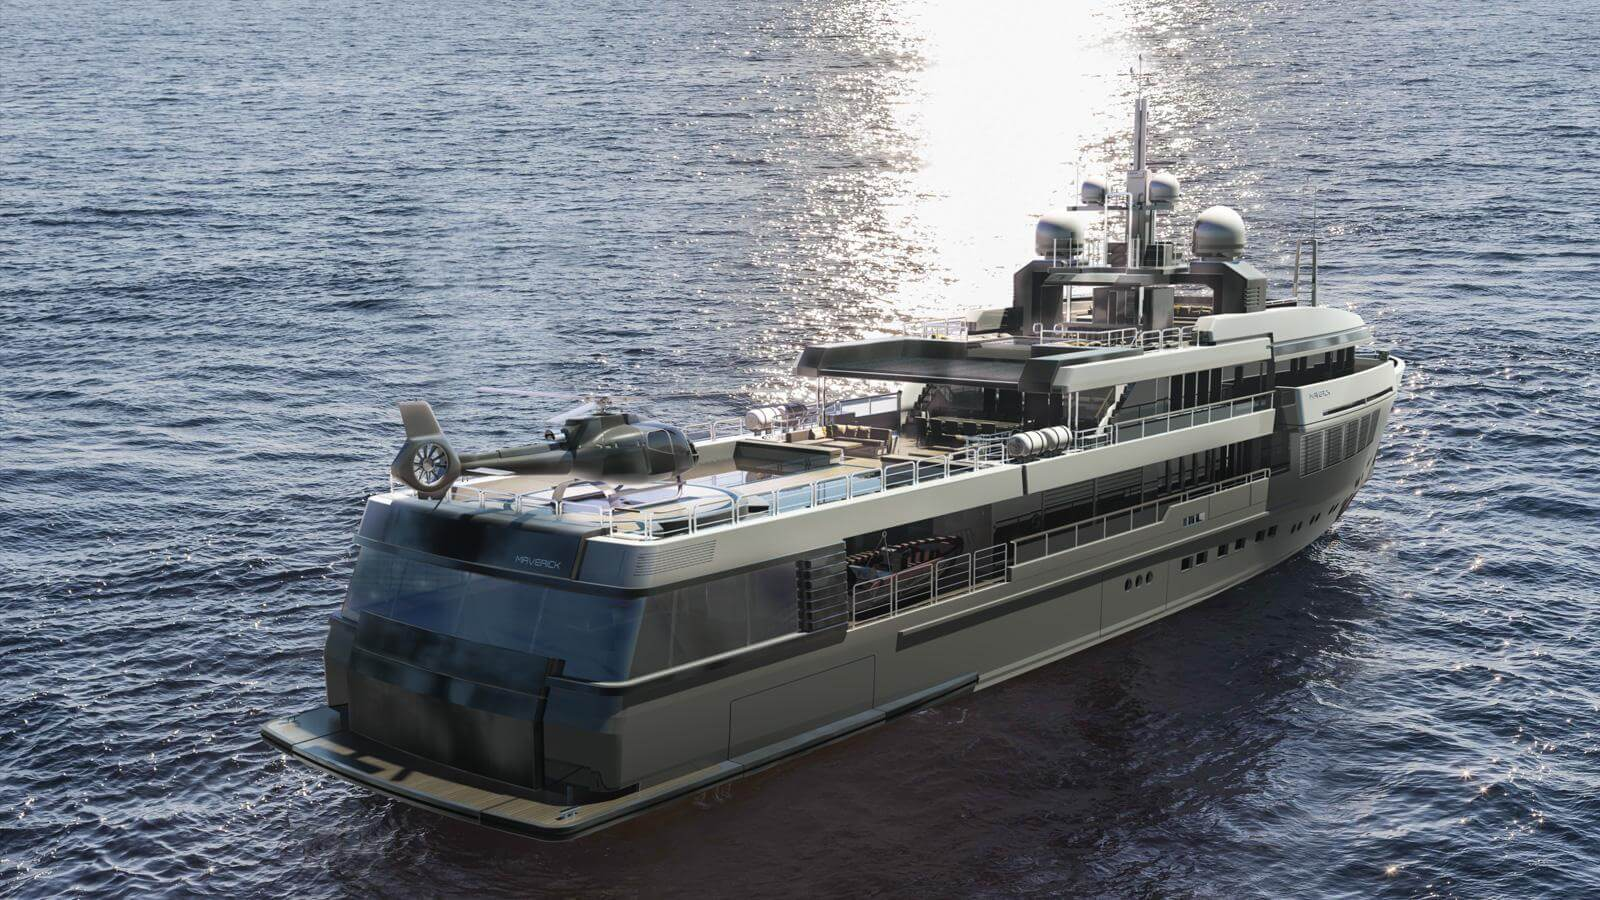 Rossinavi Explorer Yacht Concept Maverick 55 Paolo Nari Design AFT View